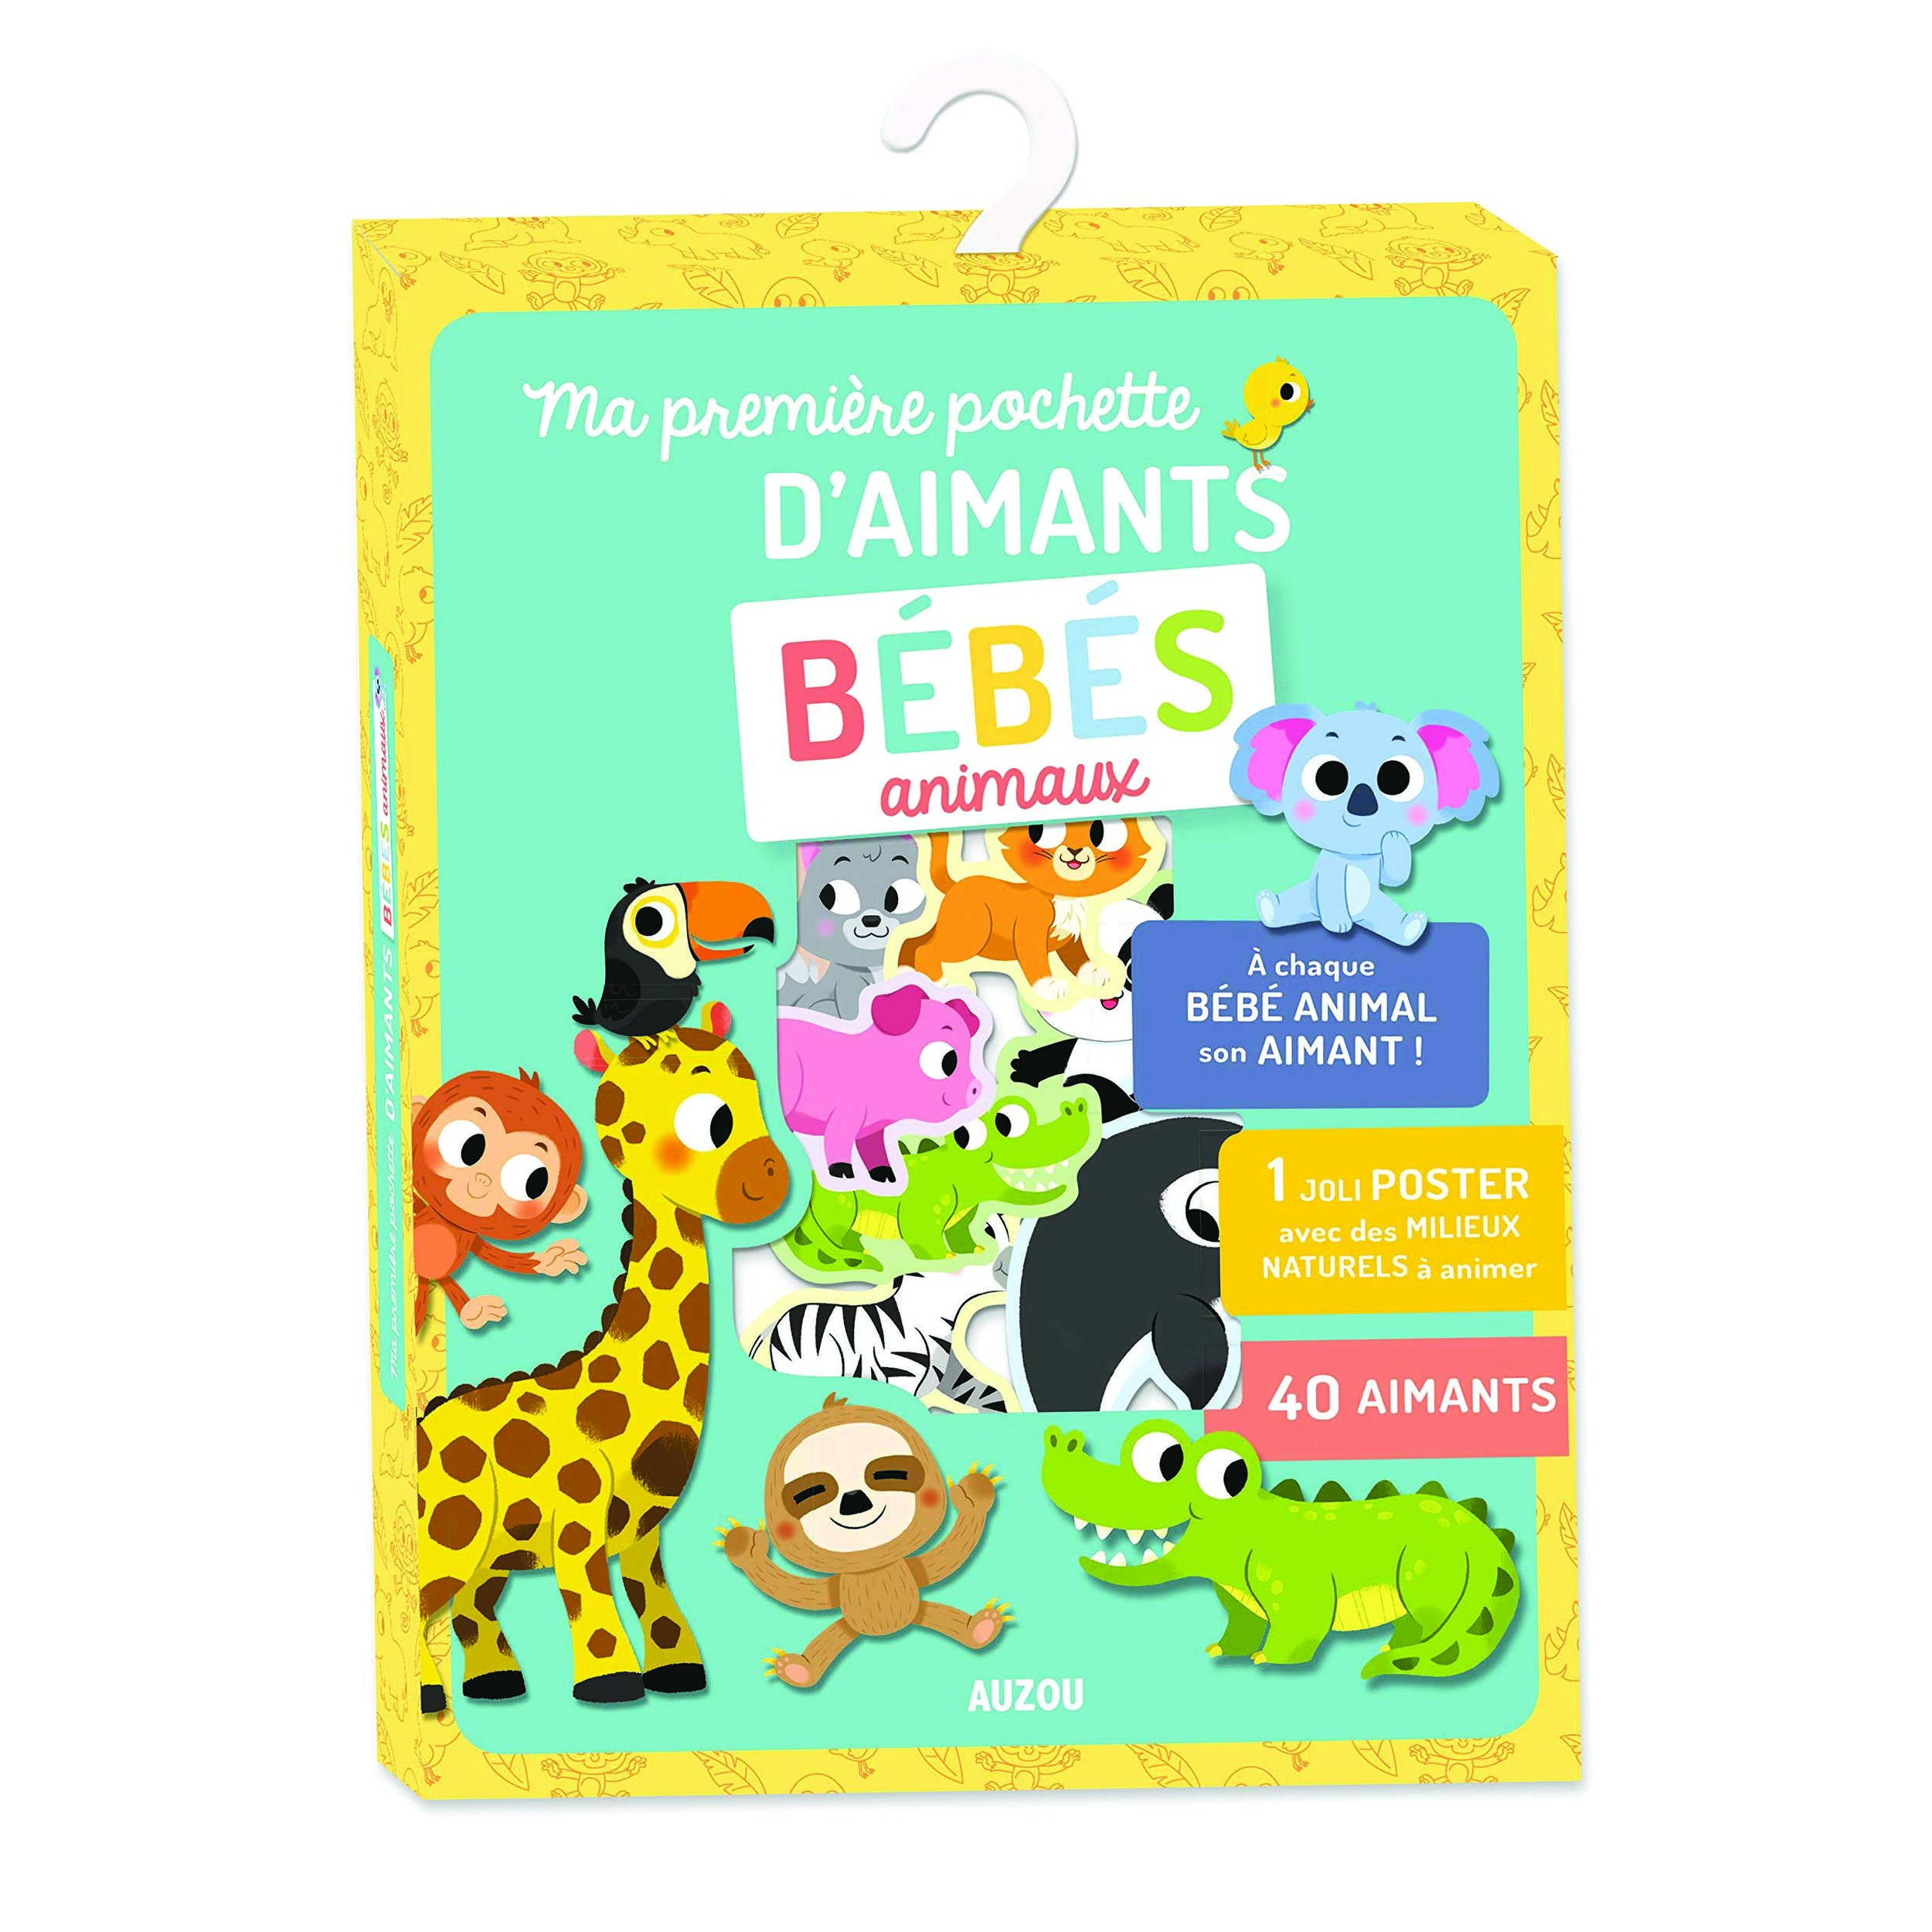 AUZOU_BABY_ANIMALS_PAMELA_BARBIERI